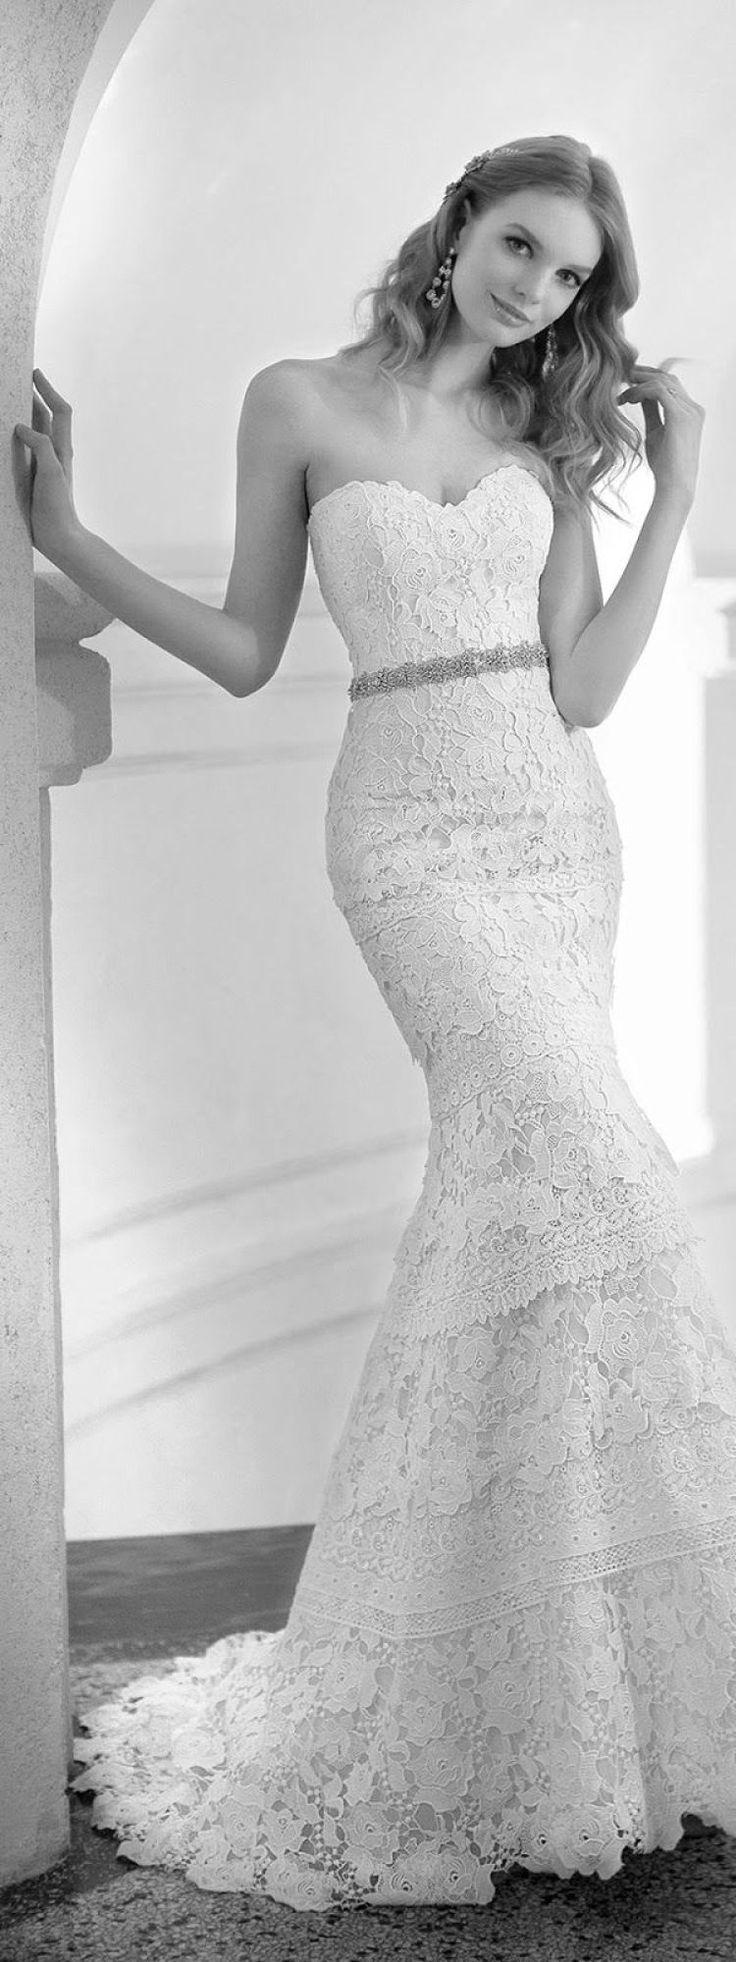 Martina Liana Wedding Dresses | 2015 Wedding Dresses - KnotsVilla